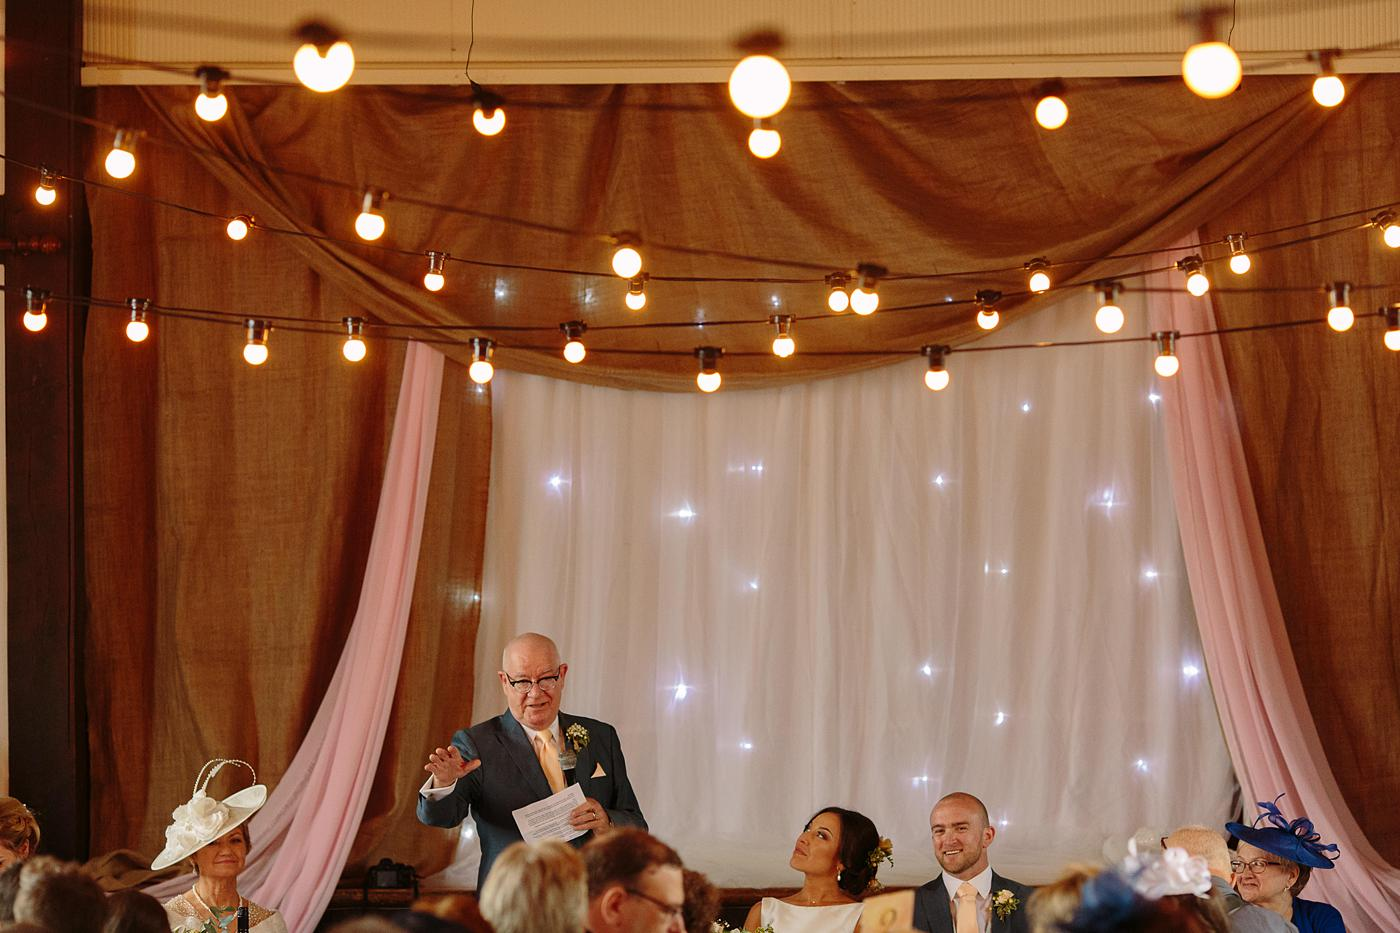 Winstanstow wedding photography 0806